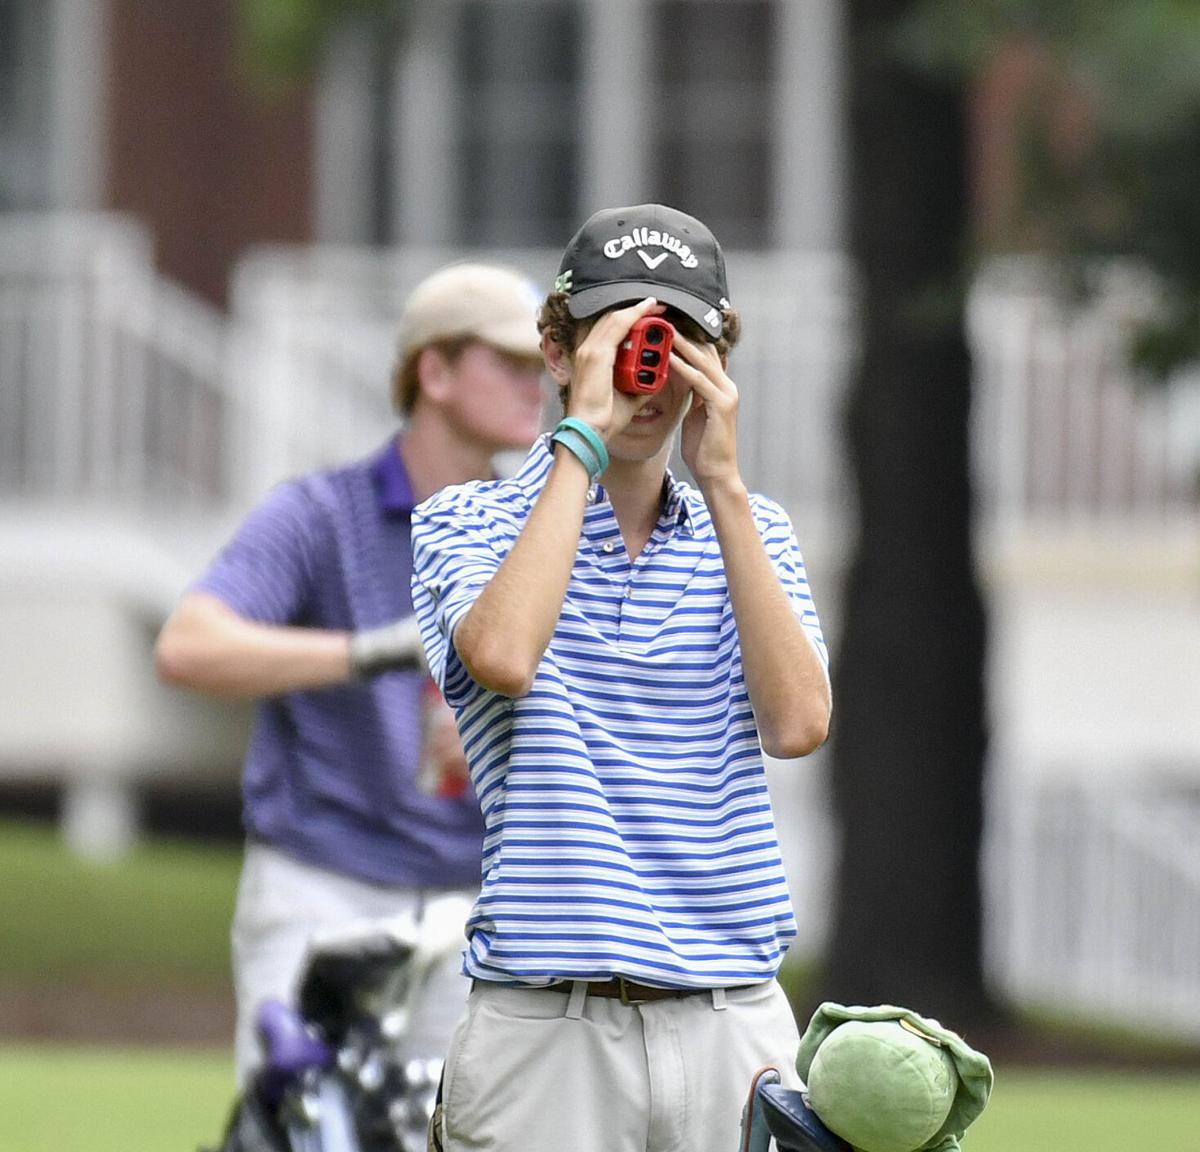 Carolinas Jr Boys' Championship